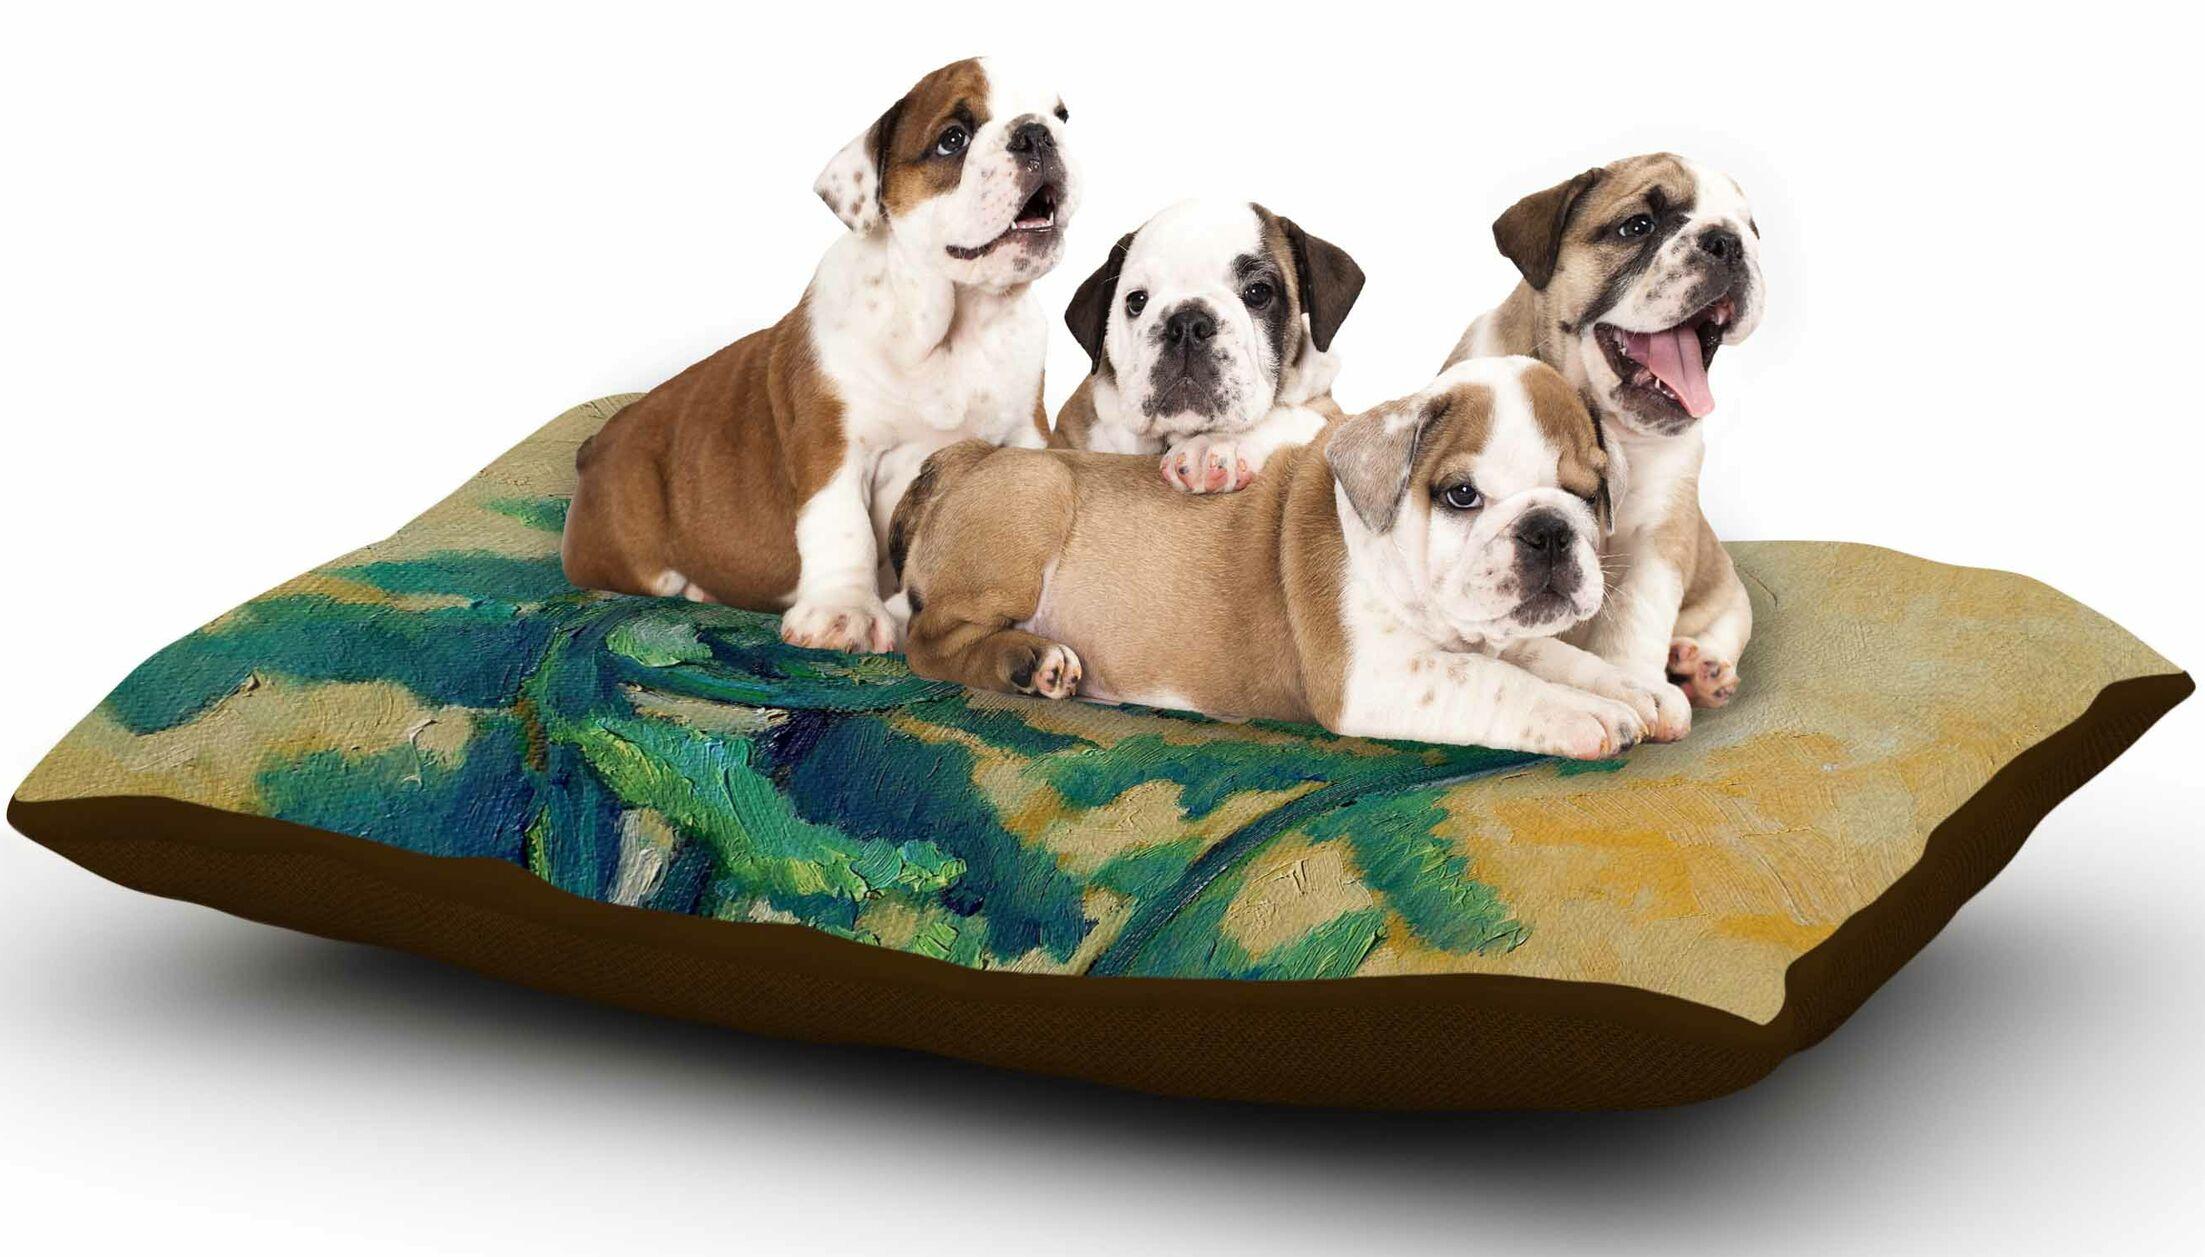 Carol Schiff 'Fiddleheads' Dog Pillow with Fleece Cozy Top